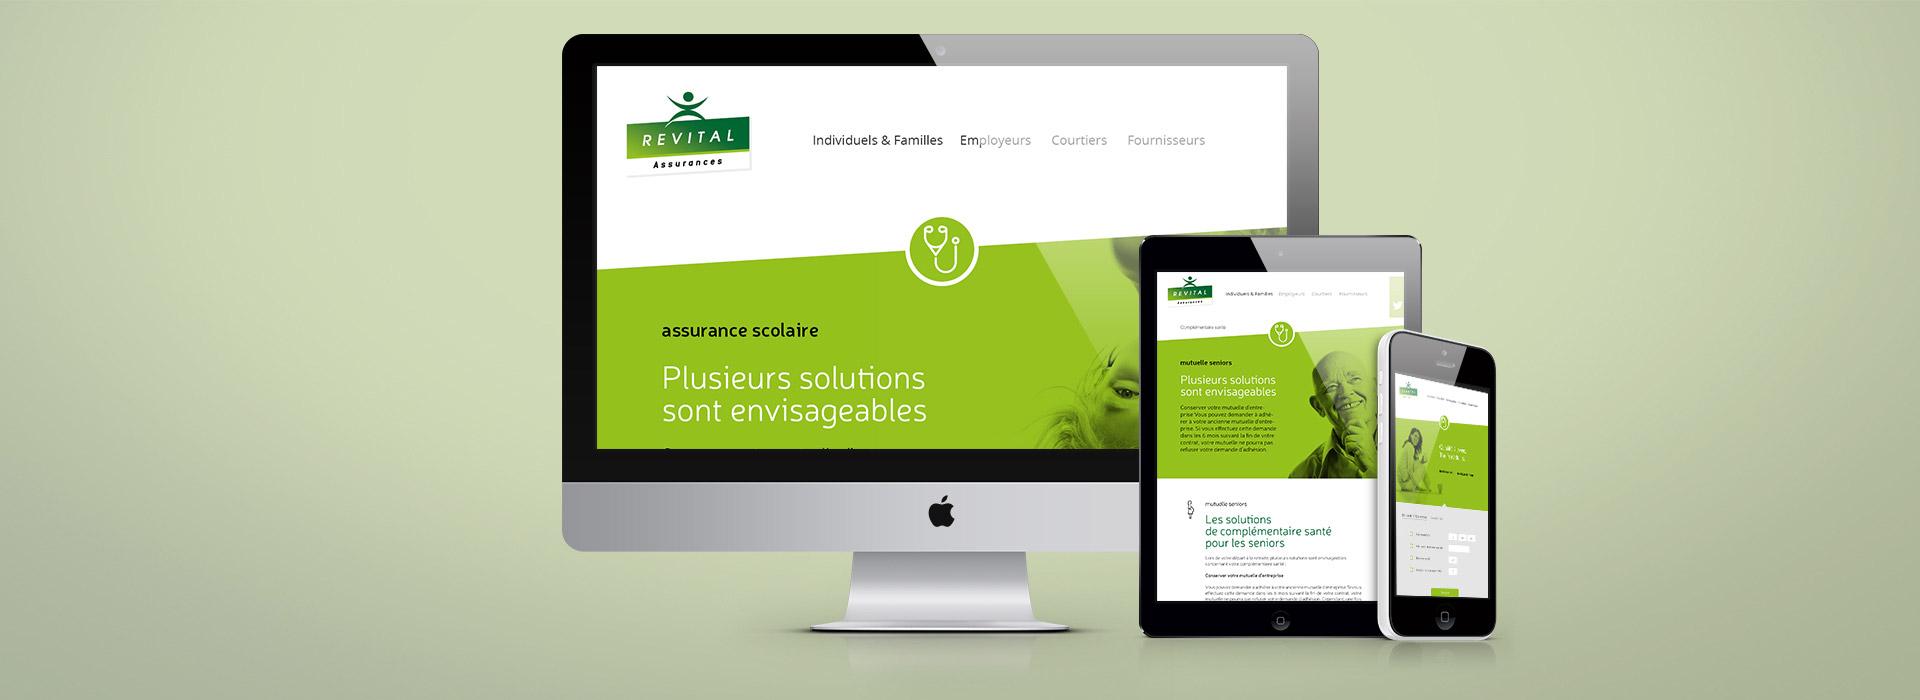 http://agence-communication-site-internet-revital-assurances